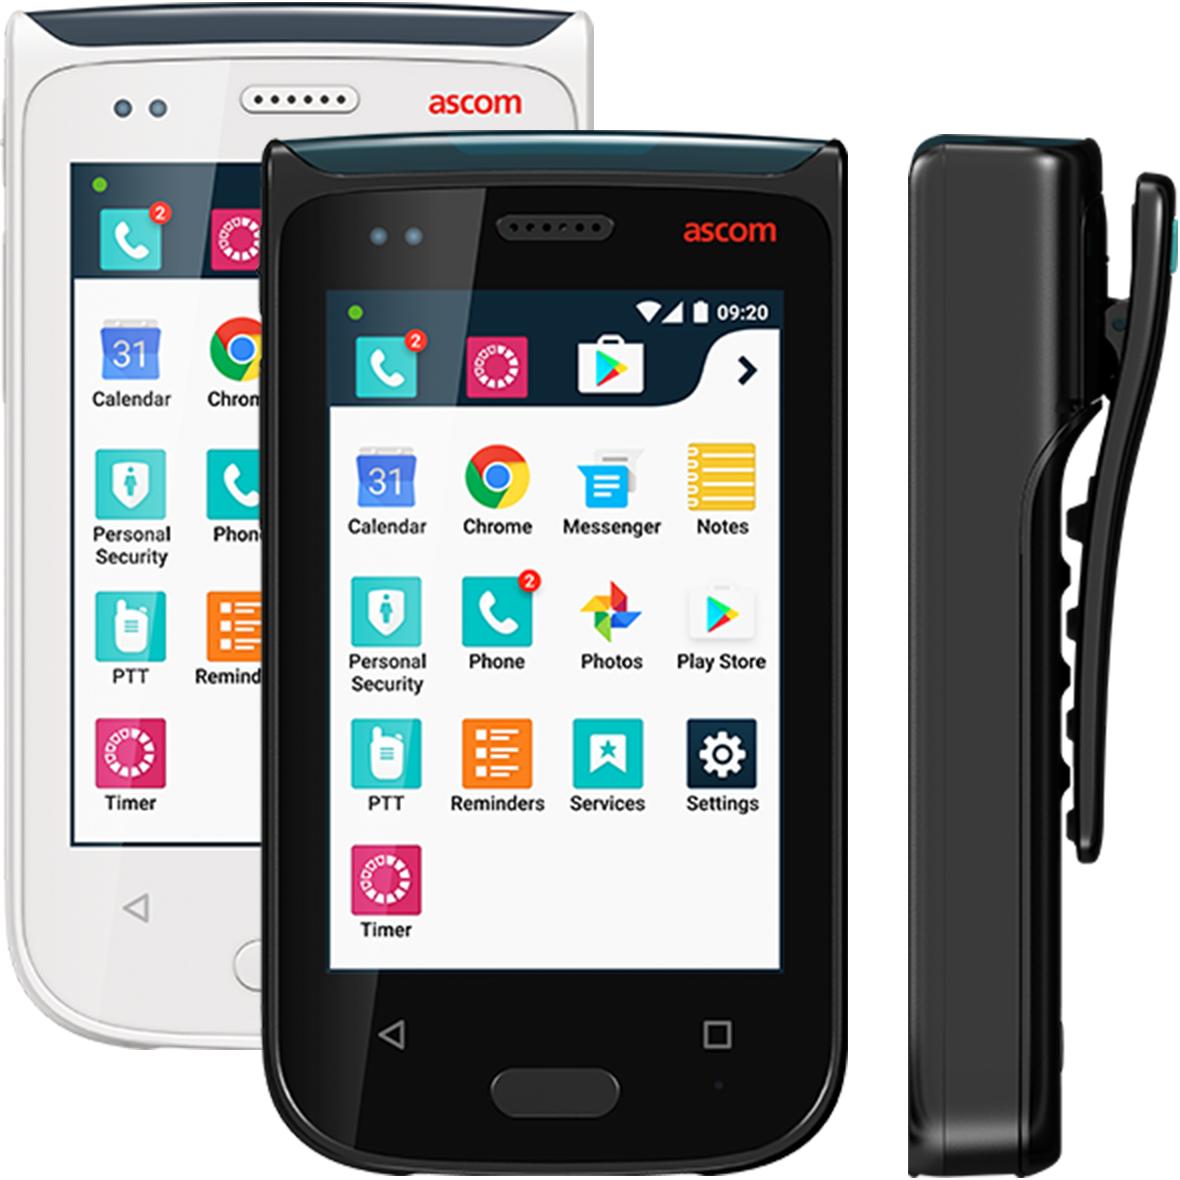 Ascom Myco 2 smartphone